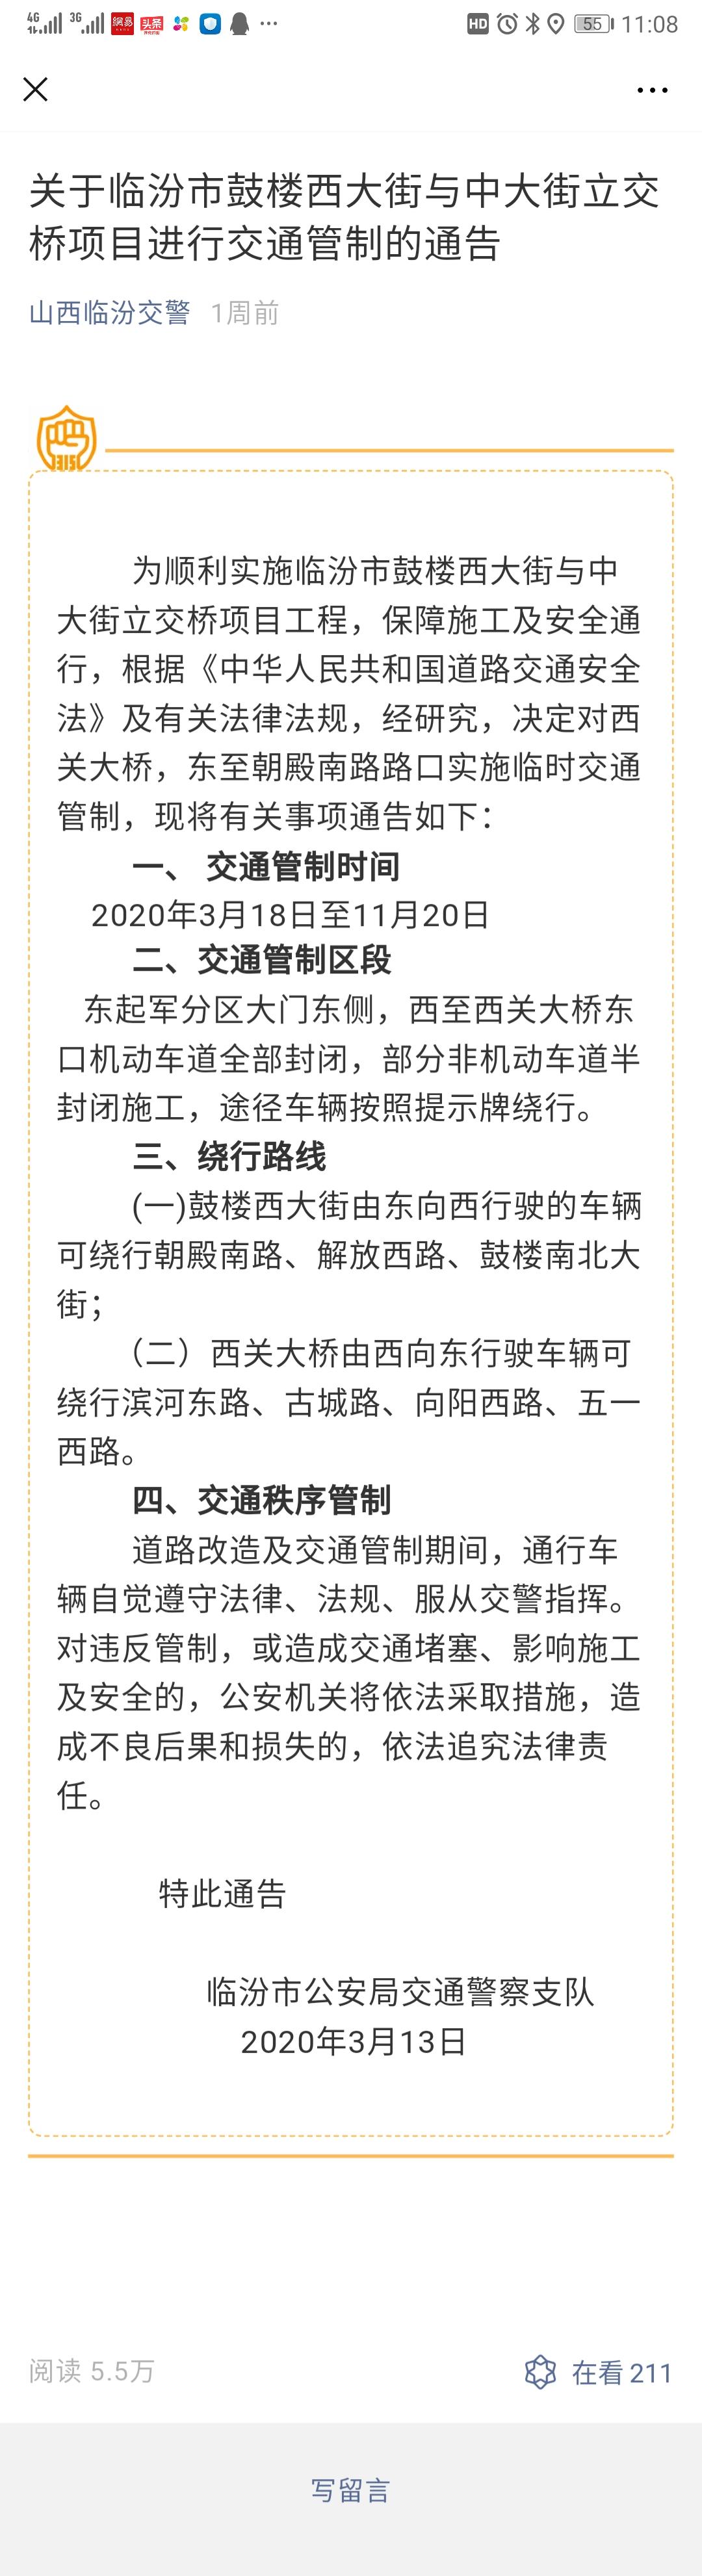 Screenshot_20200325_110829_com.tencent.mm.jpg